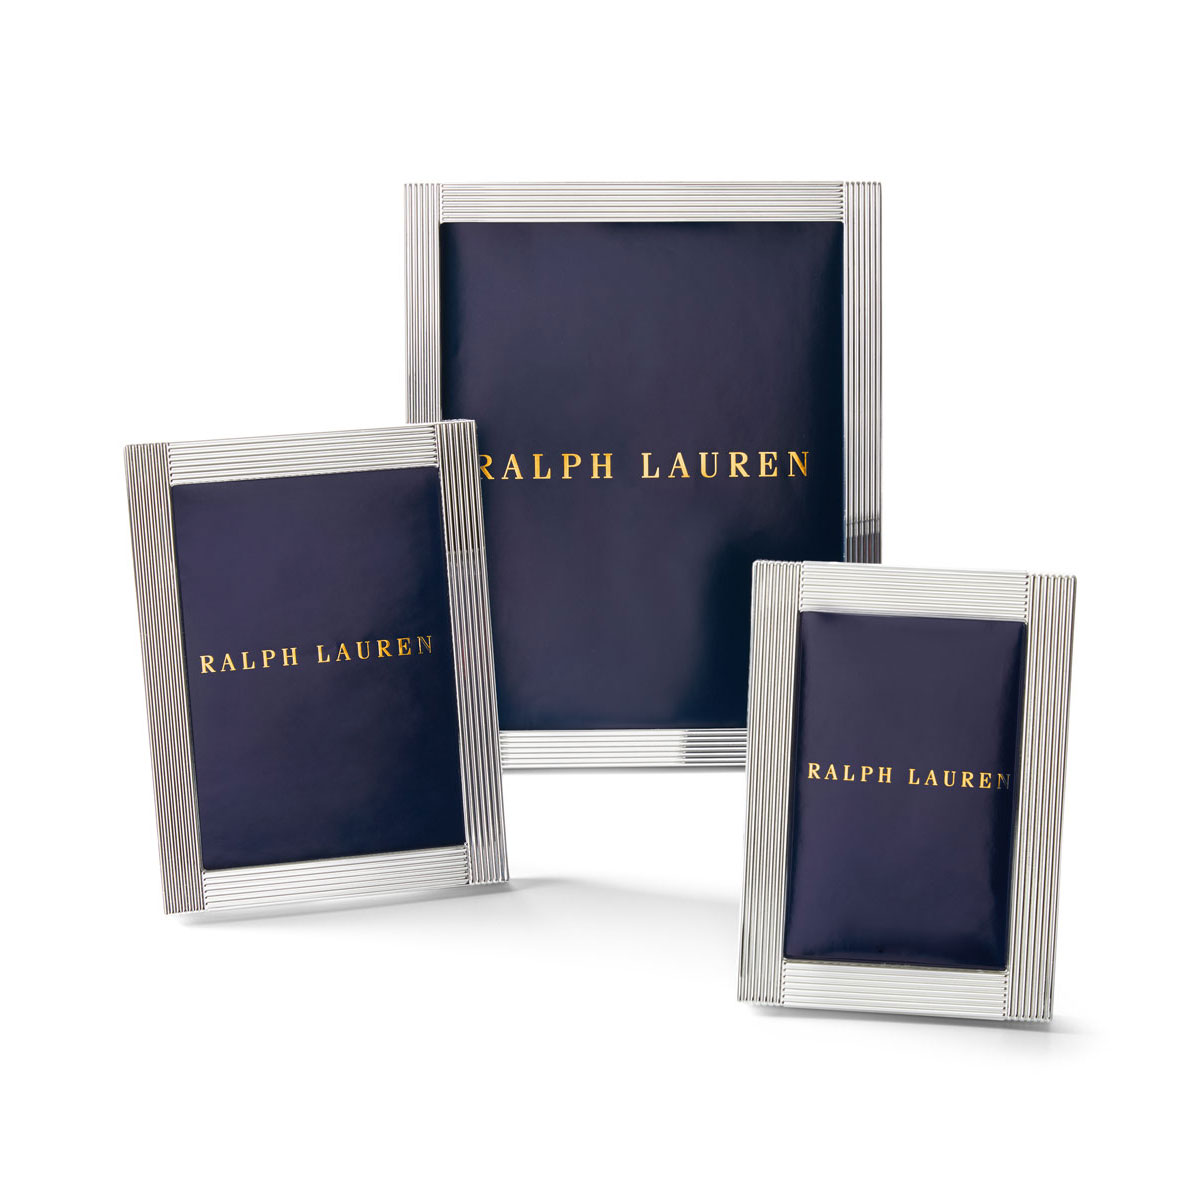 "Ralph Lauren Luke 8x10"" Picture Frame"